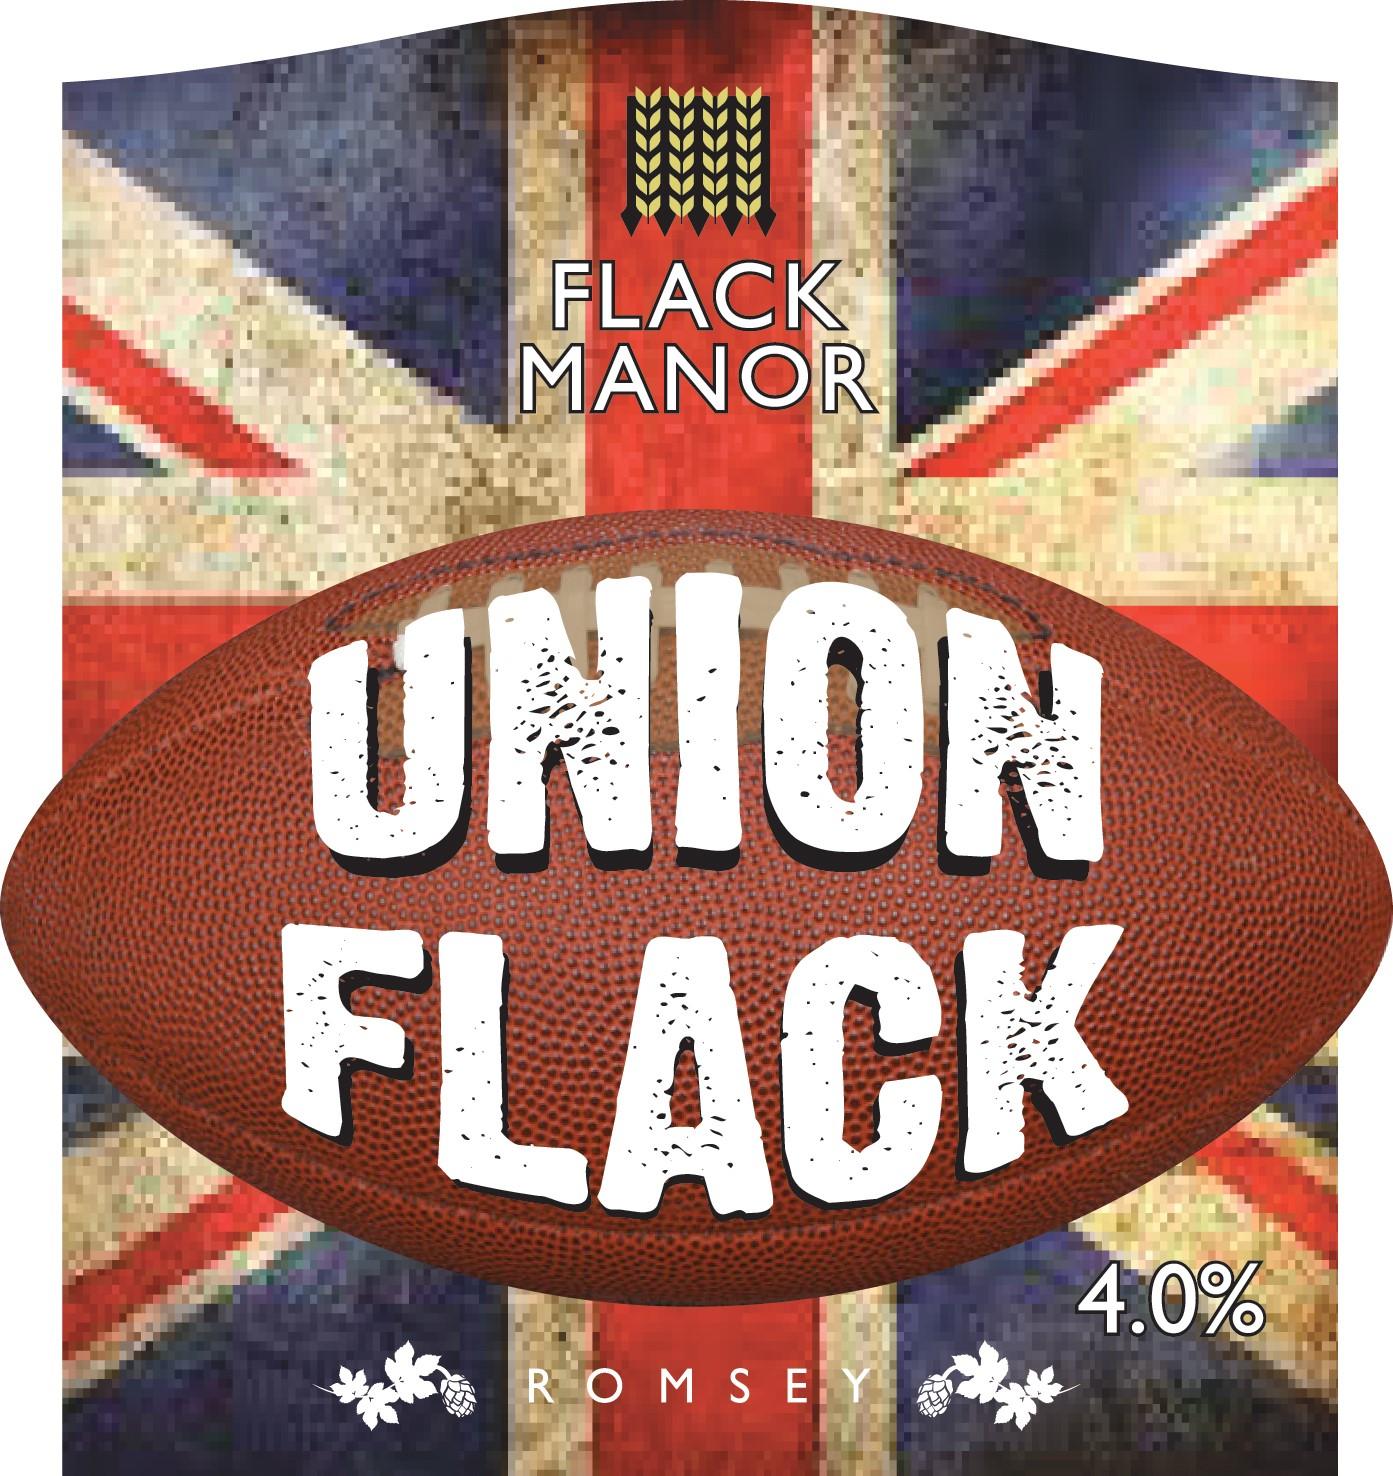 Union Flack